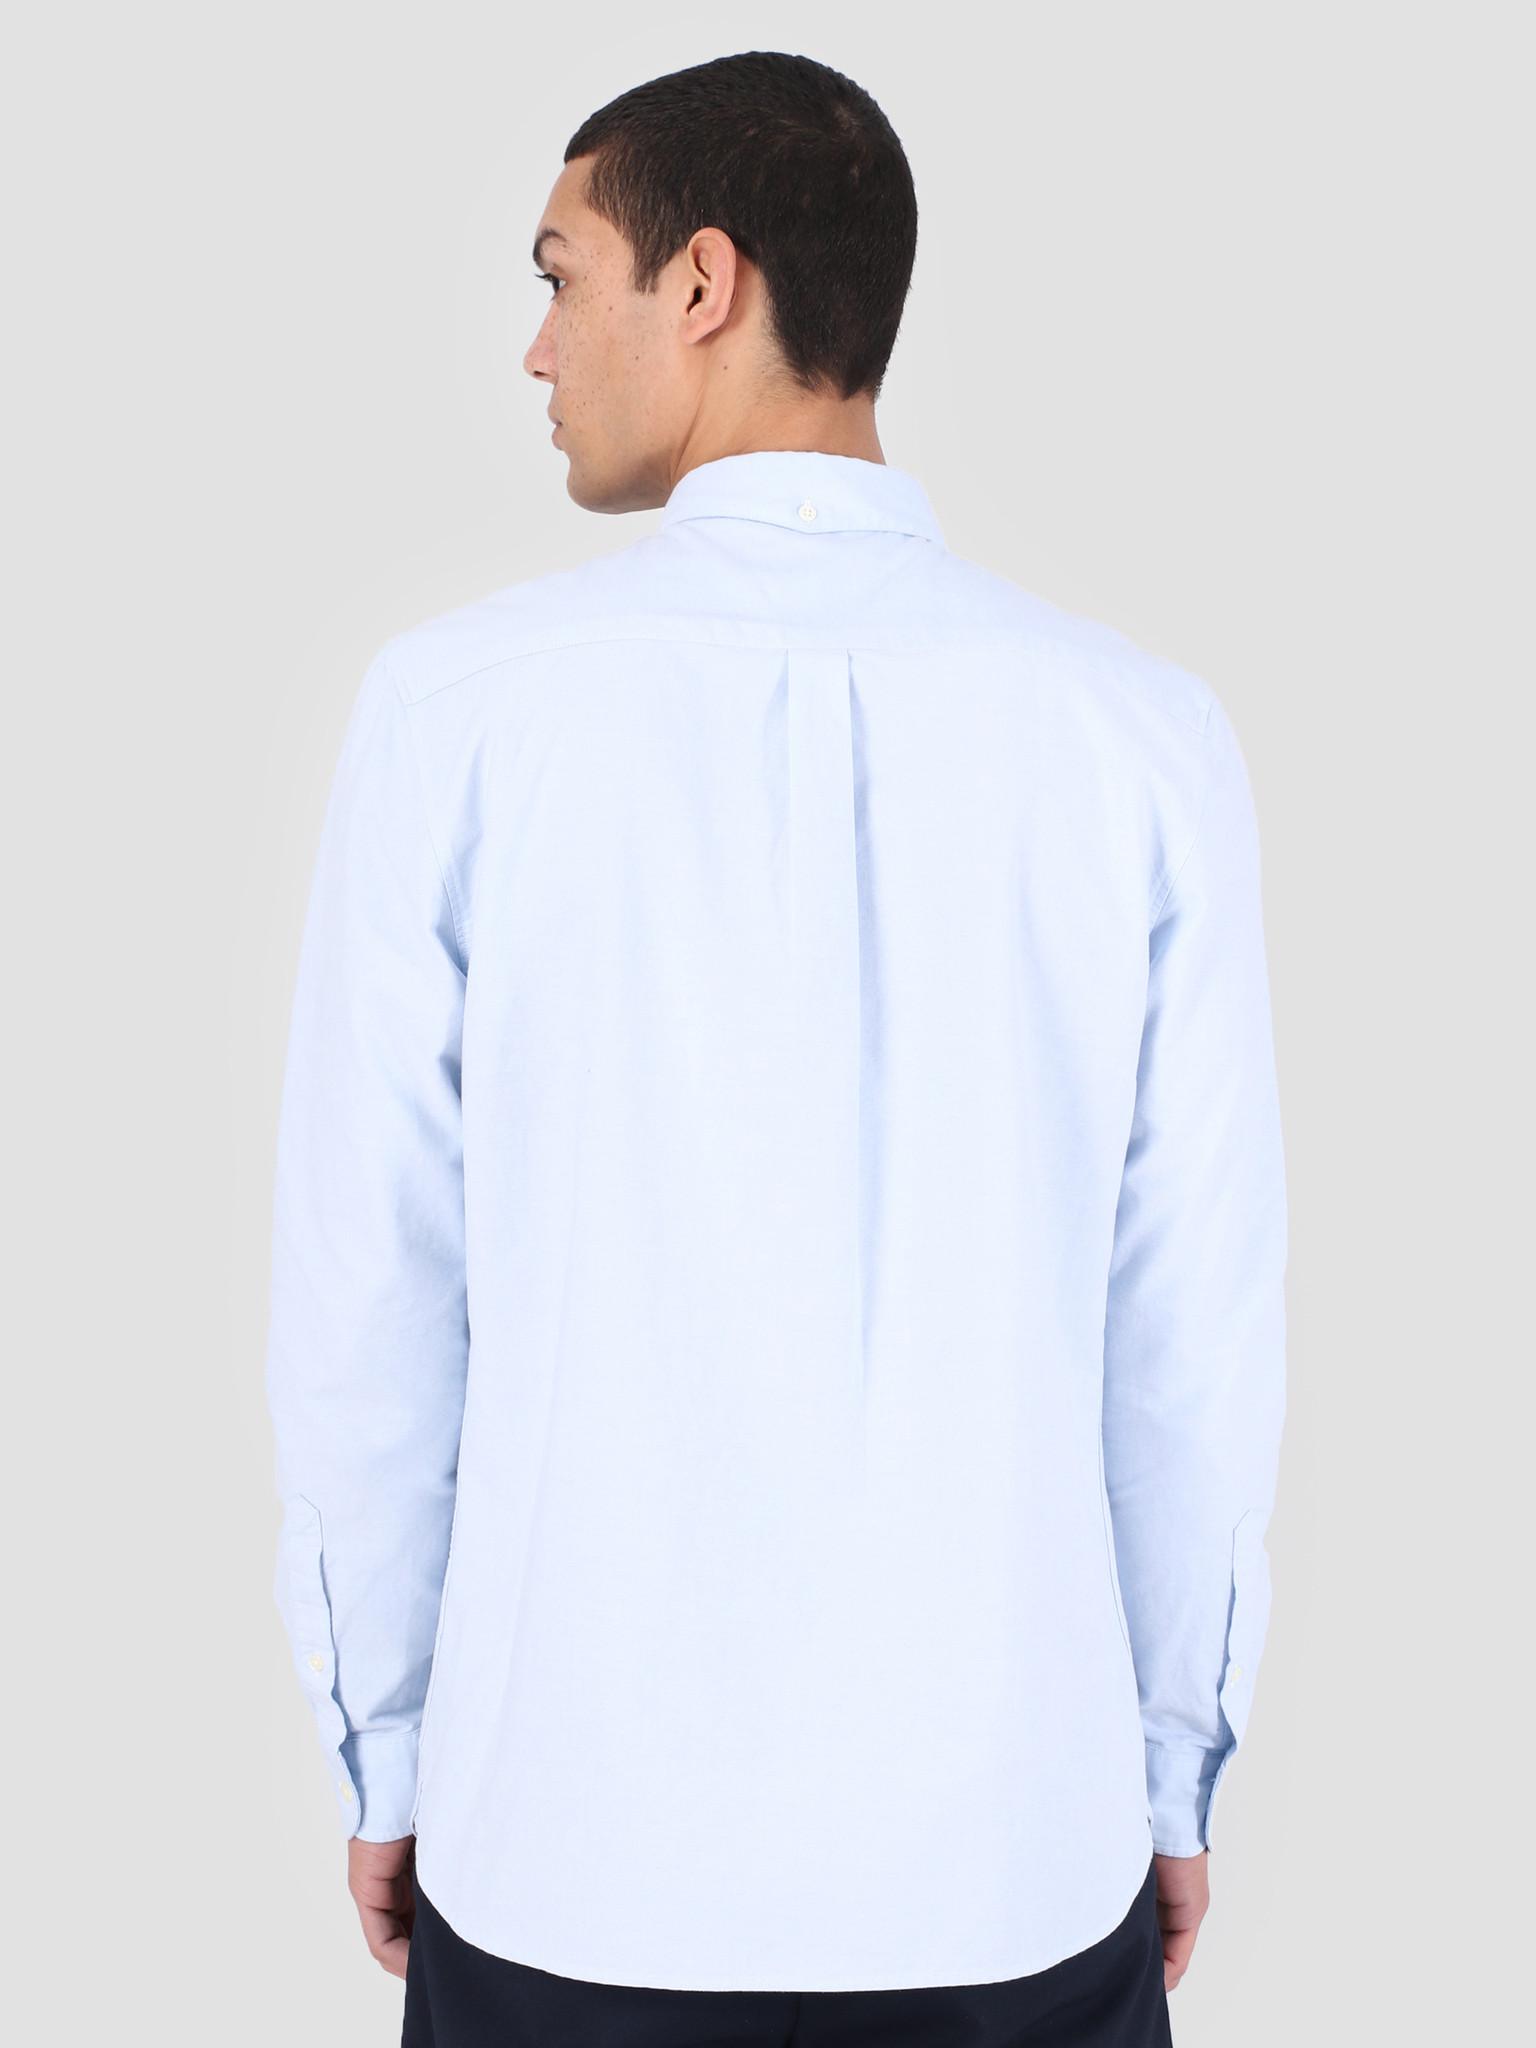 Lacoste Lacoste LIVE 1HC2 Men'S Longsleeve Woven Shirt 01 Creek White CH3766-91